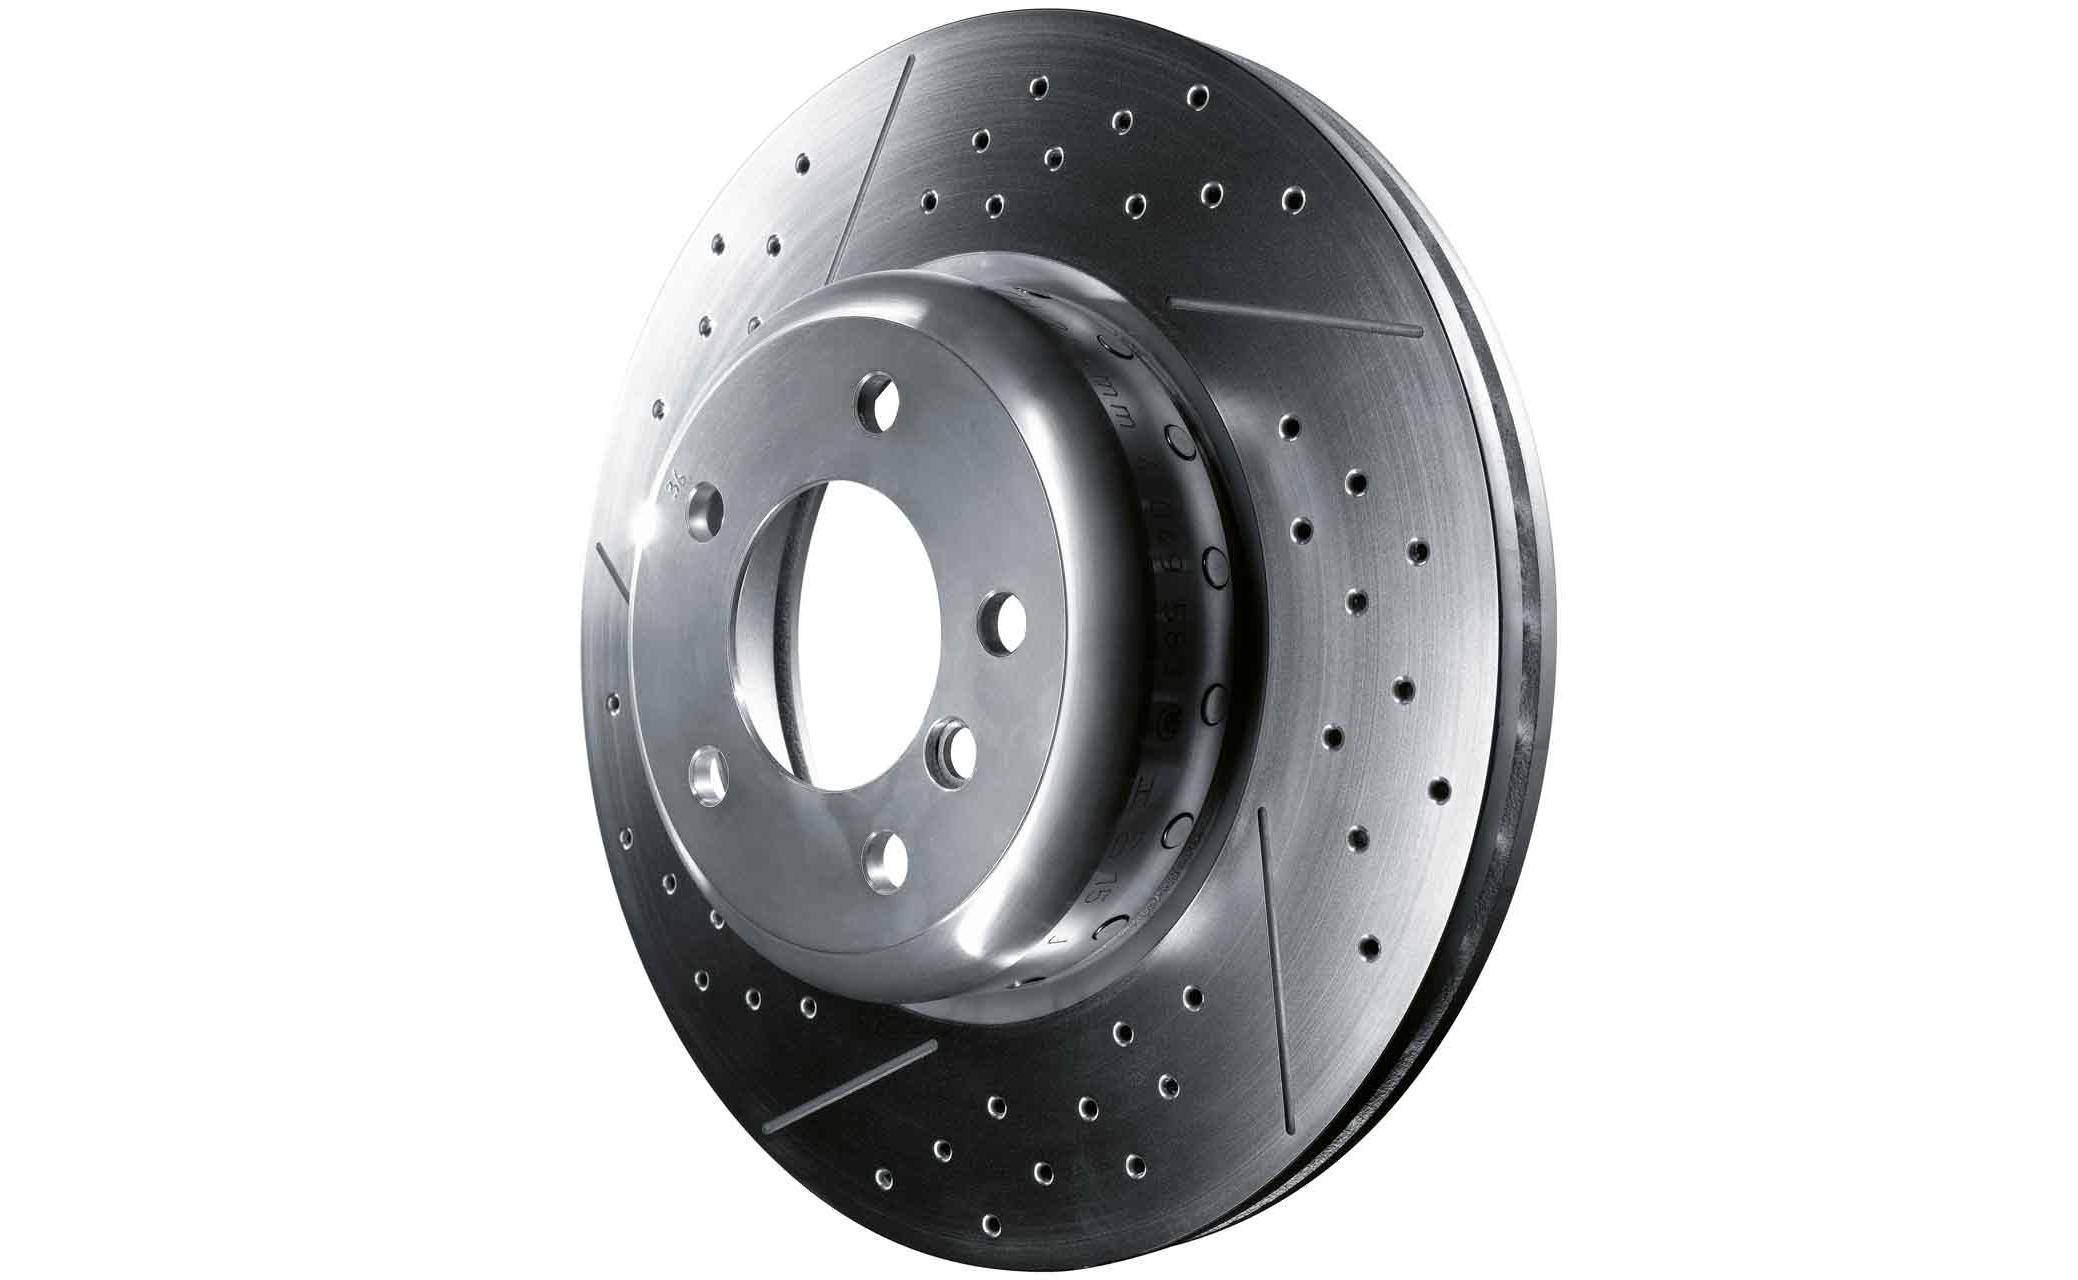 bmw performance genuine drilled brake disc set rear e82 e88 1 series 34216795754. Black Bedroom Furniture Sets. Home Design Ideas